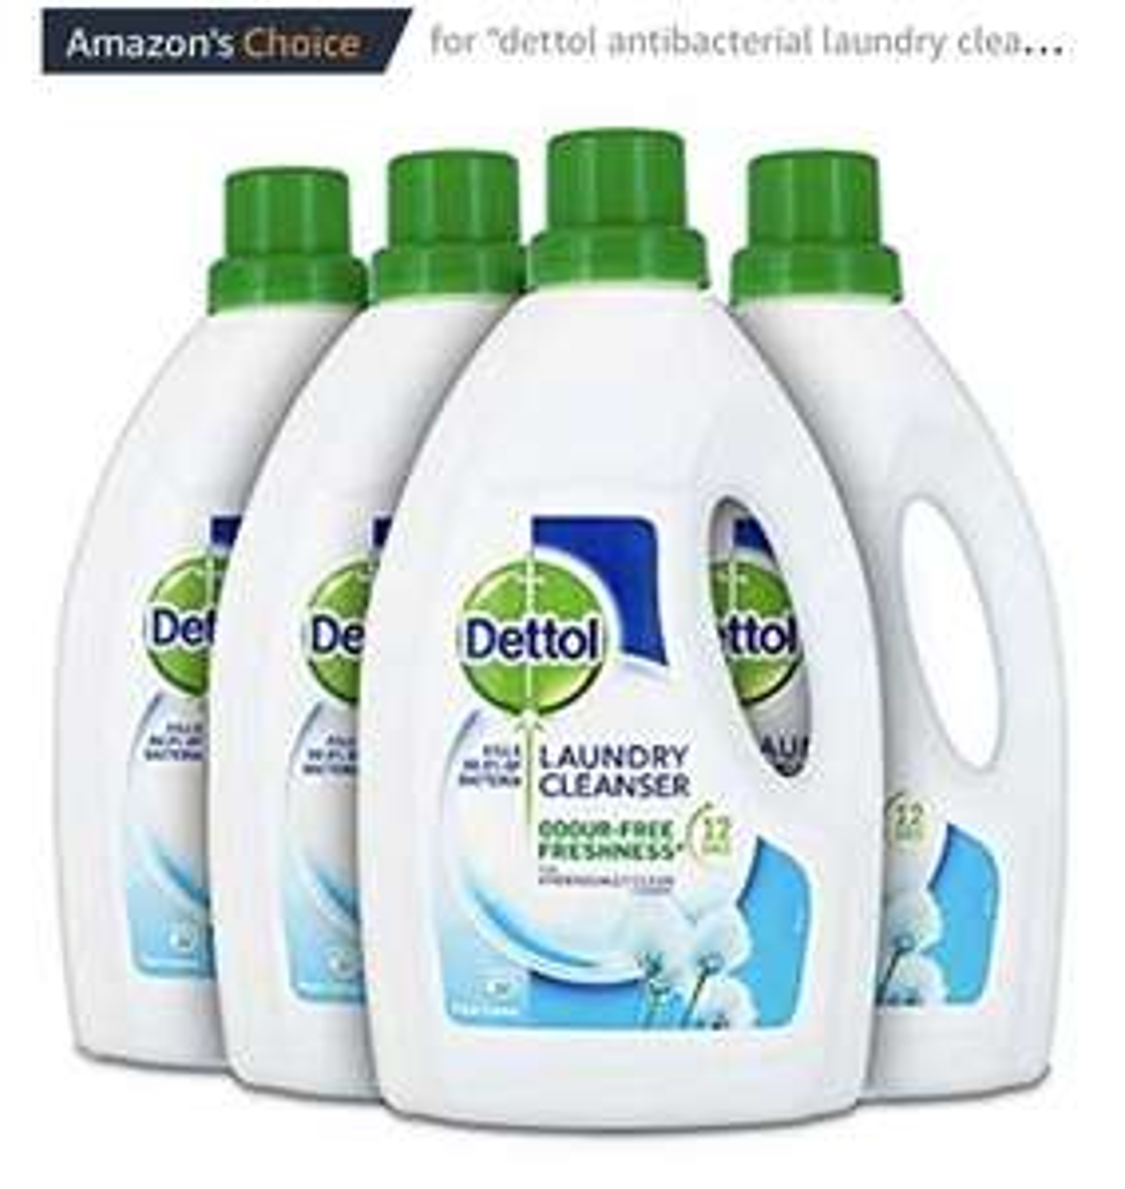 Dettol Antibacterial Laundry Cleanser Liquid Additive, Fresh Cotton, Multipack of 4 x 1.5 Litre £7.49 @ Amazon Prime / £11.98 Non Prime